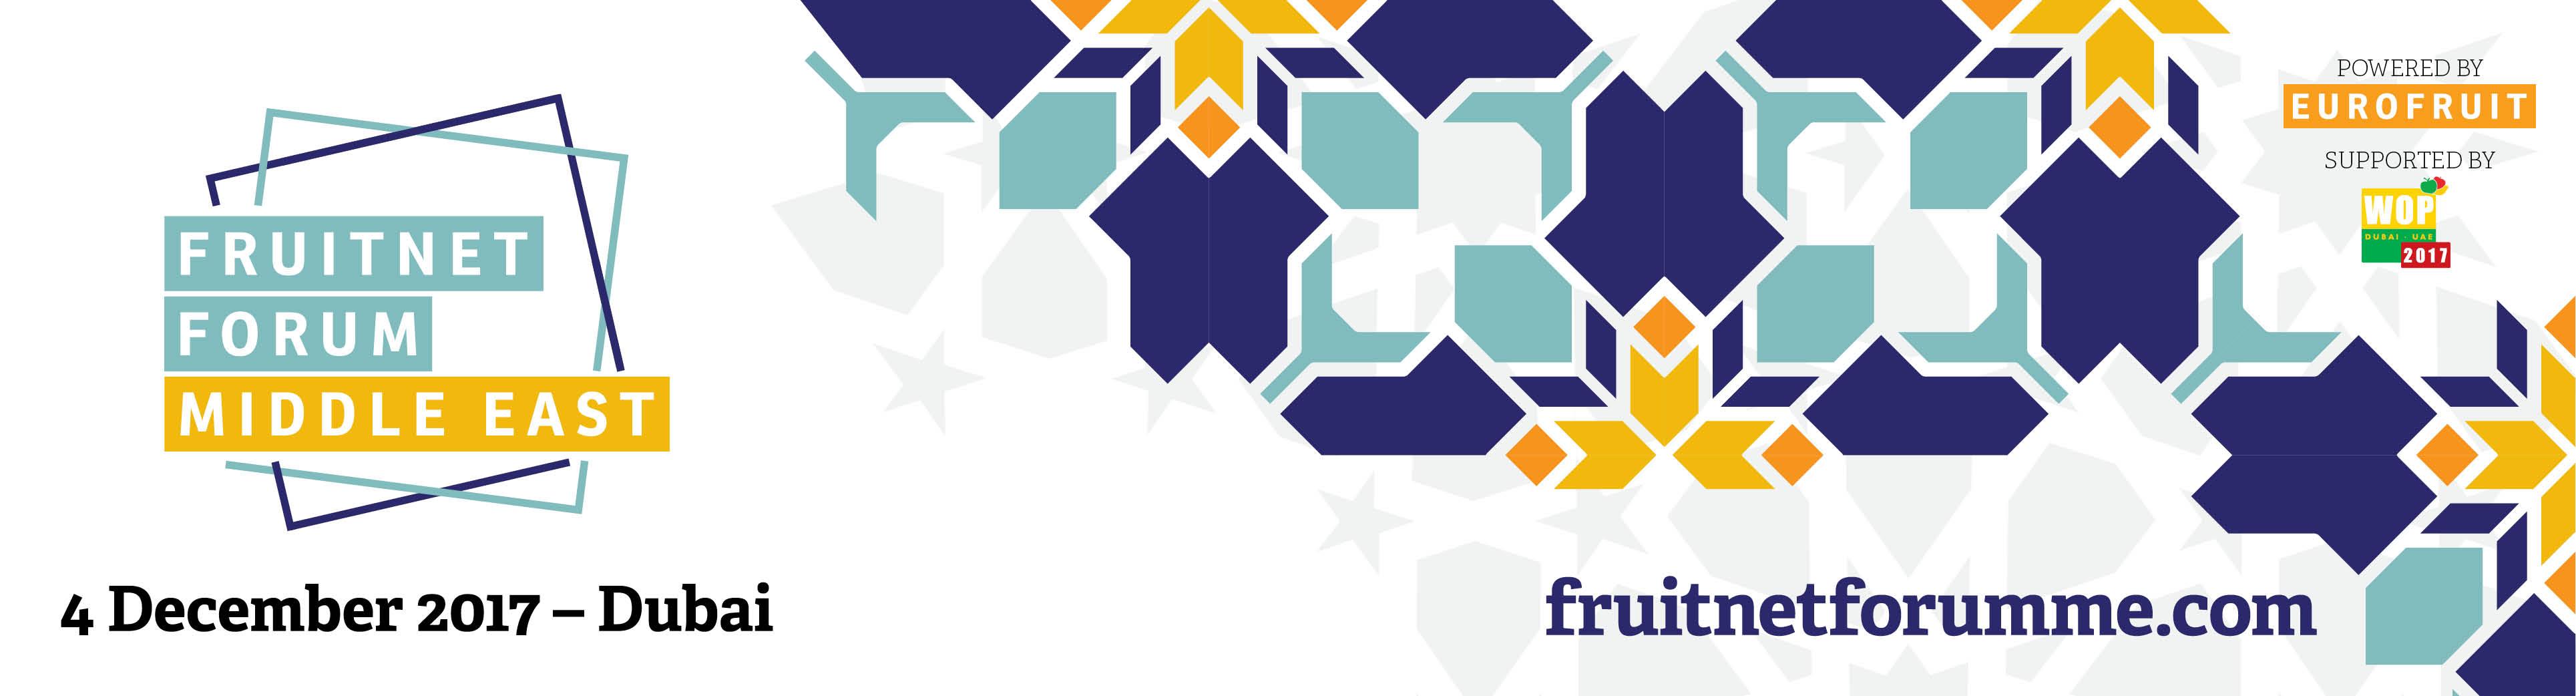 Fruitnet Forum Middle East 2017